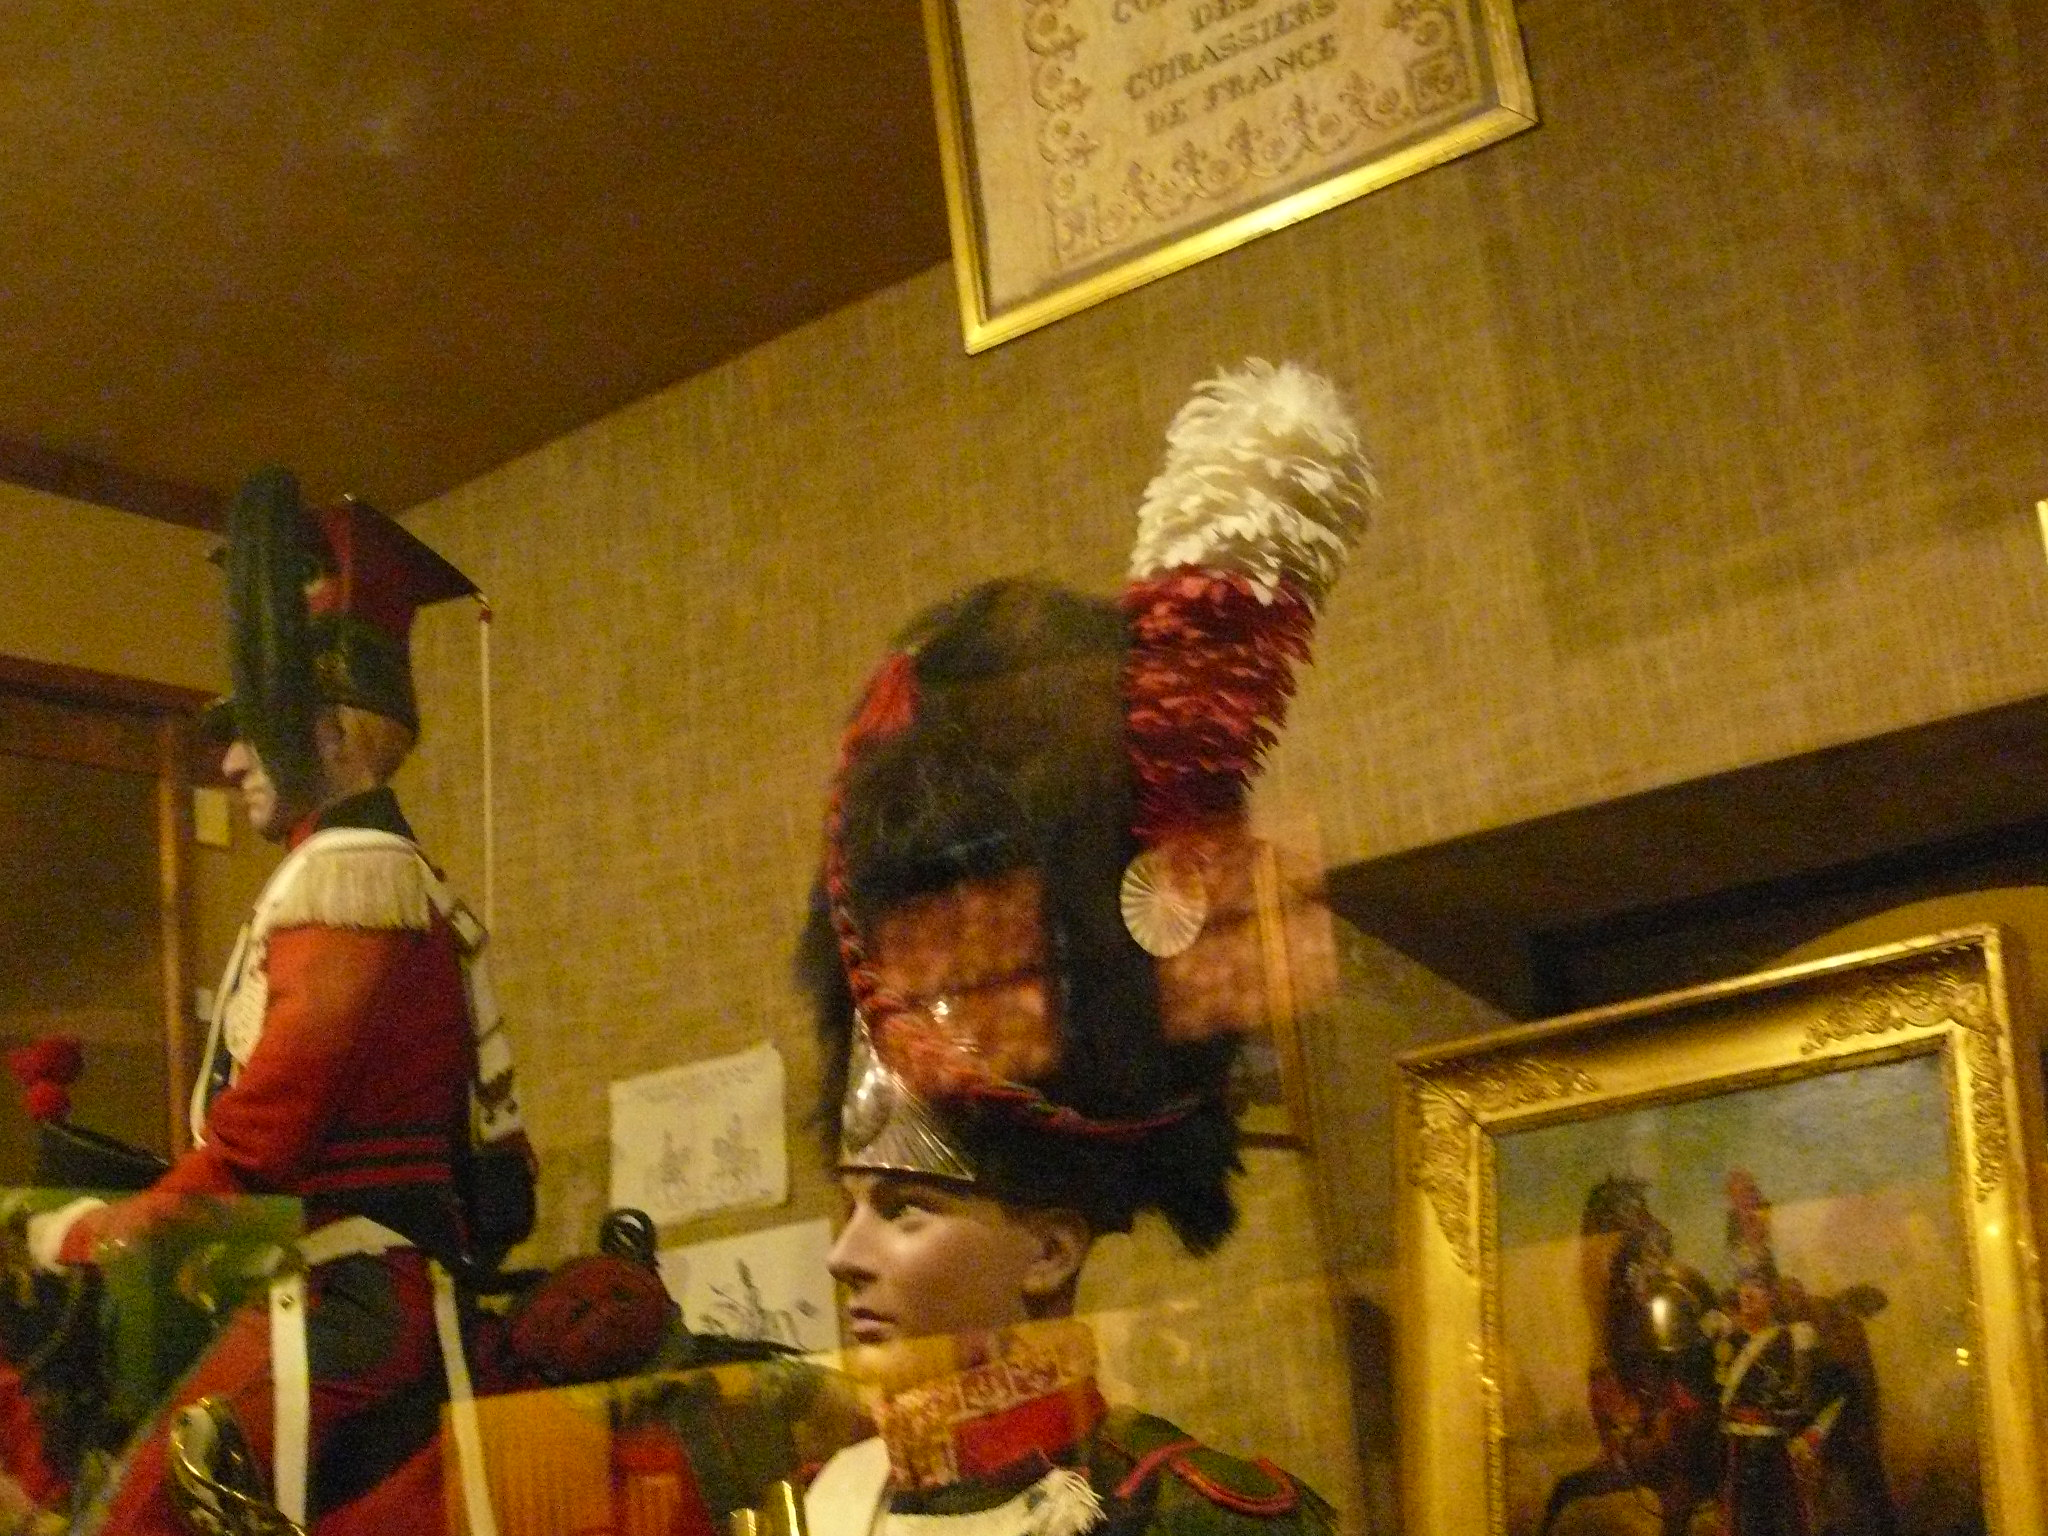 1814 garde nationale paris tambour salon de provence le monde de la maquette - Medecin de garde salon de provence ...